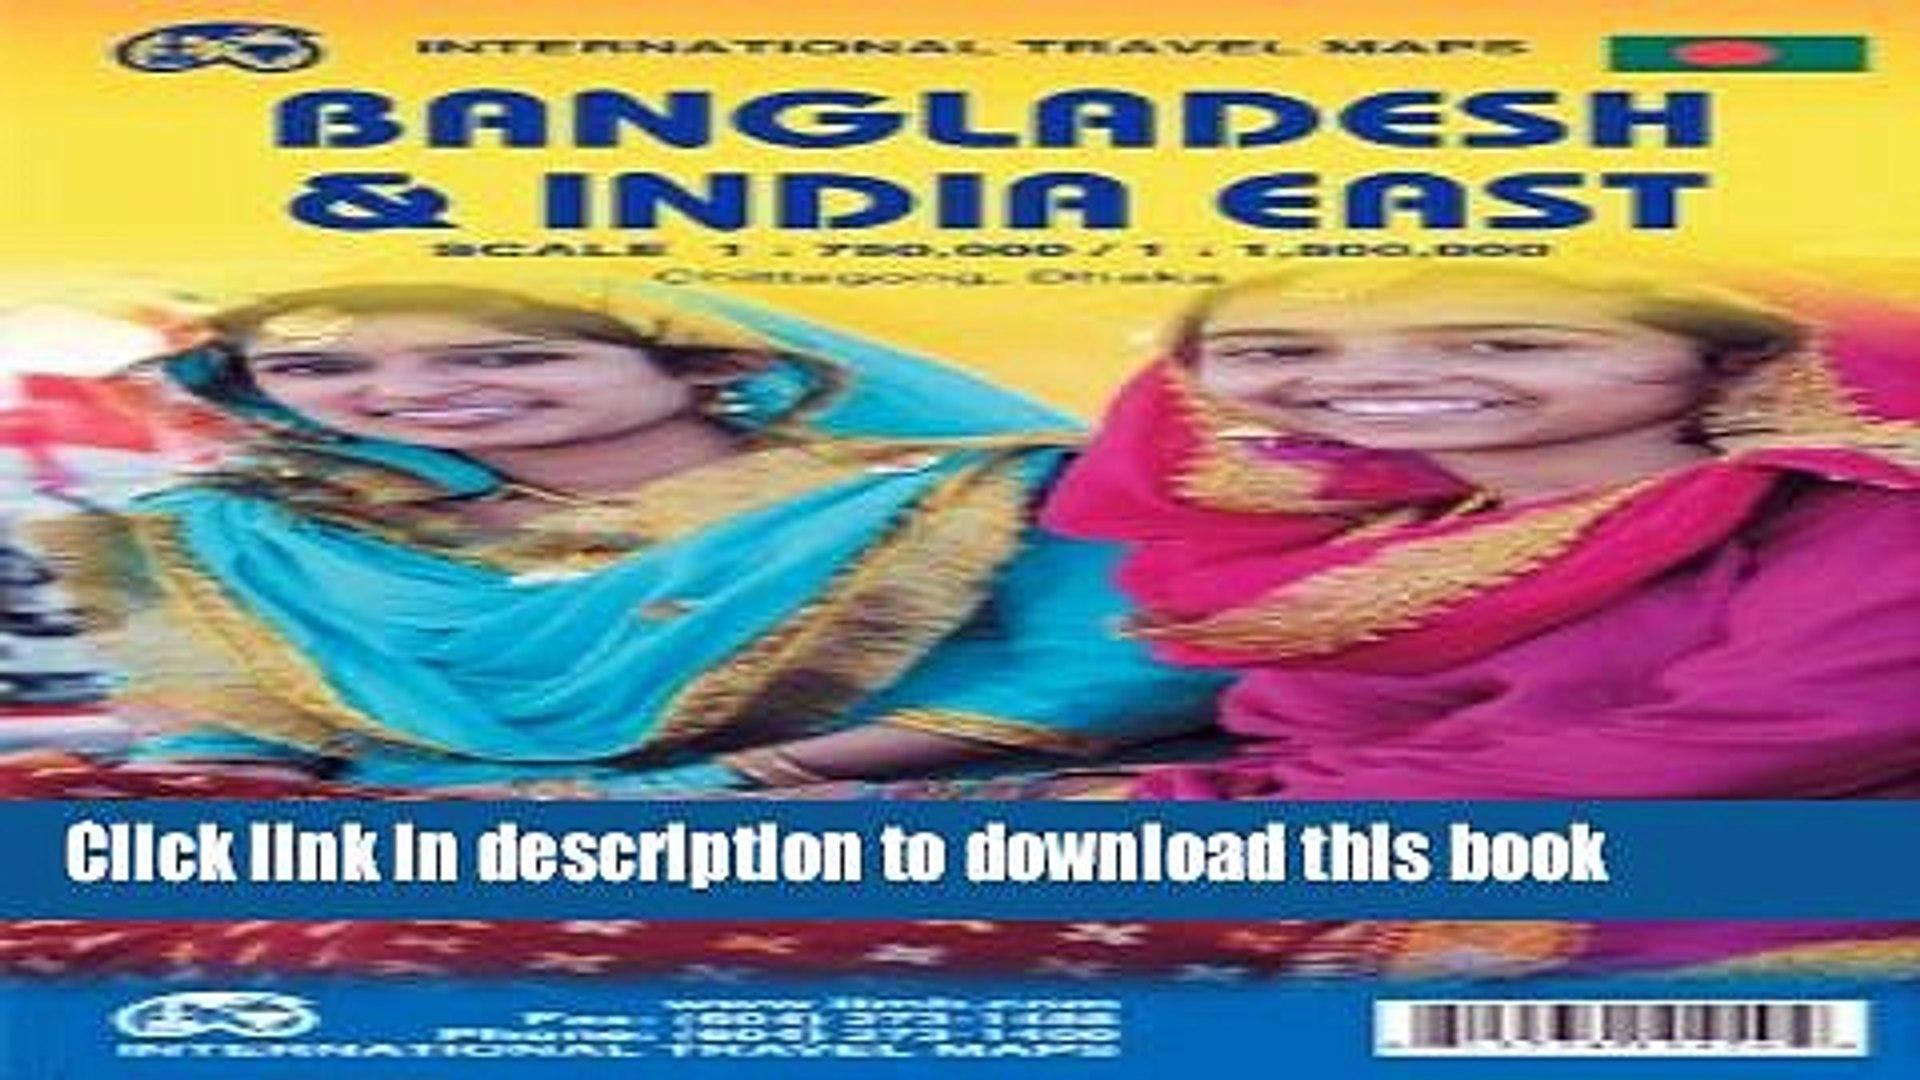 [Download] BANGLADESH   EAST INDIA - BANGLADESH ET INDE DE L EST Kindle Online